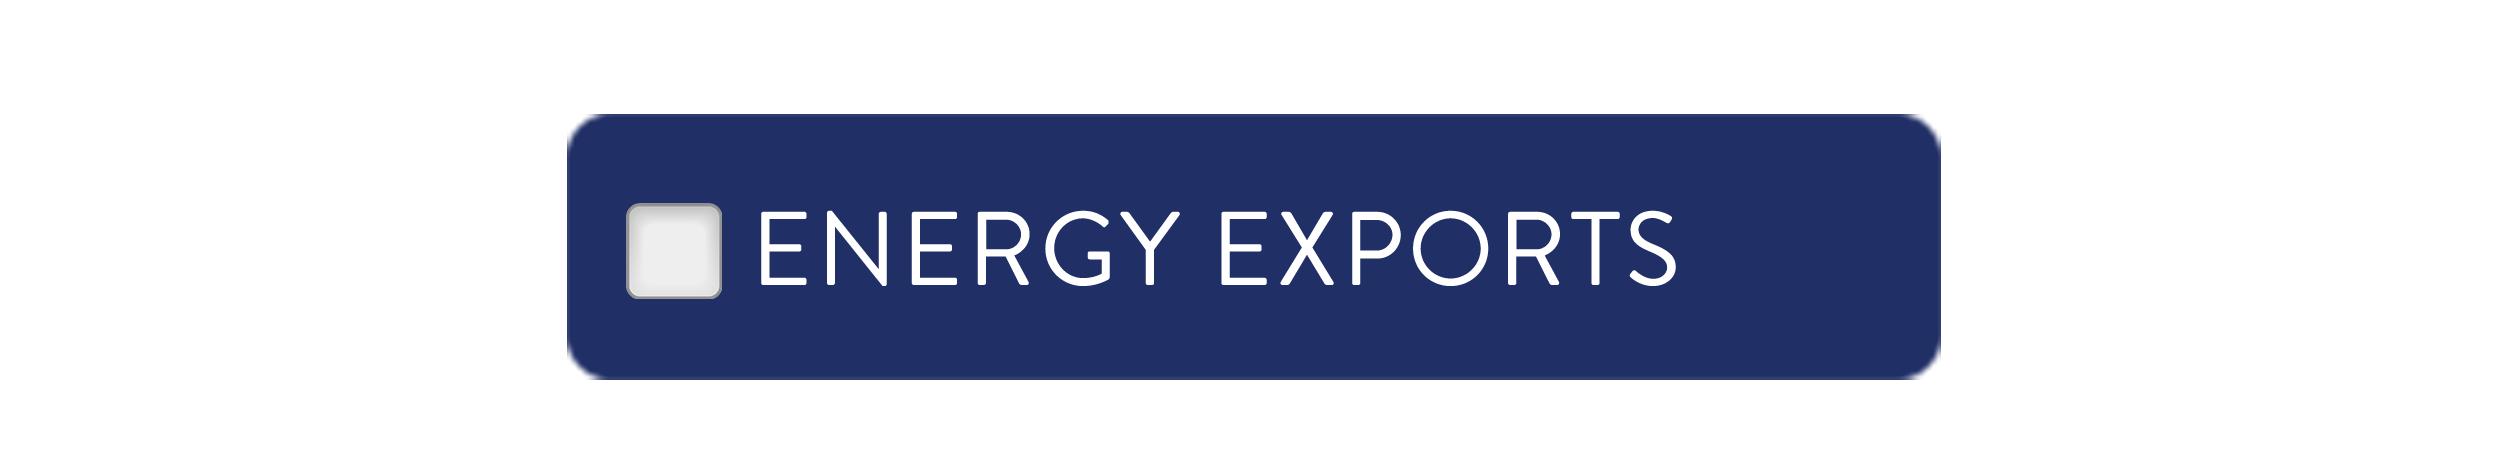 Energy Exports